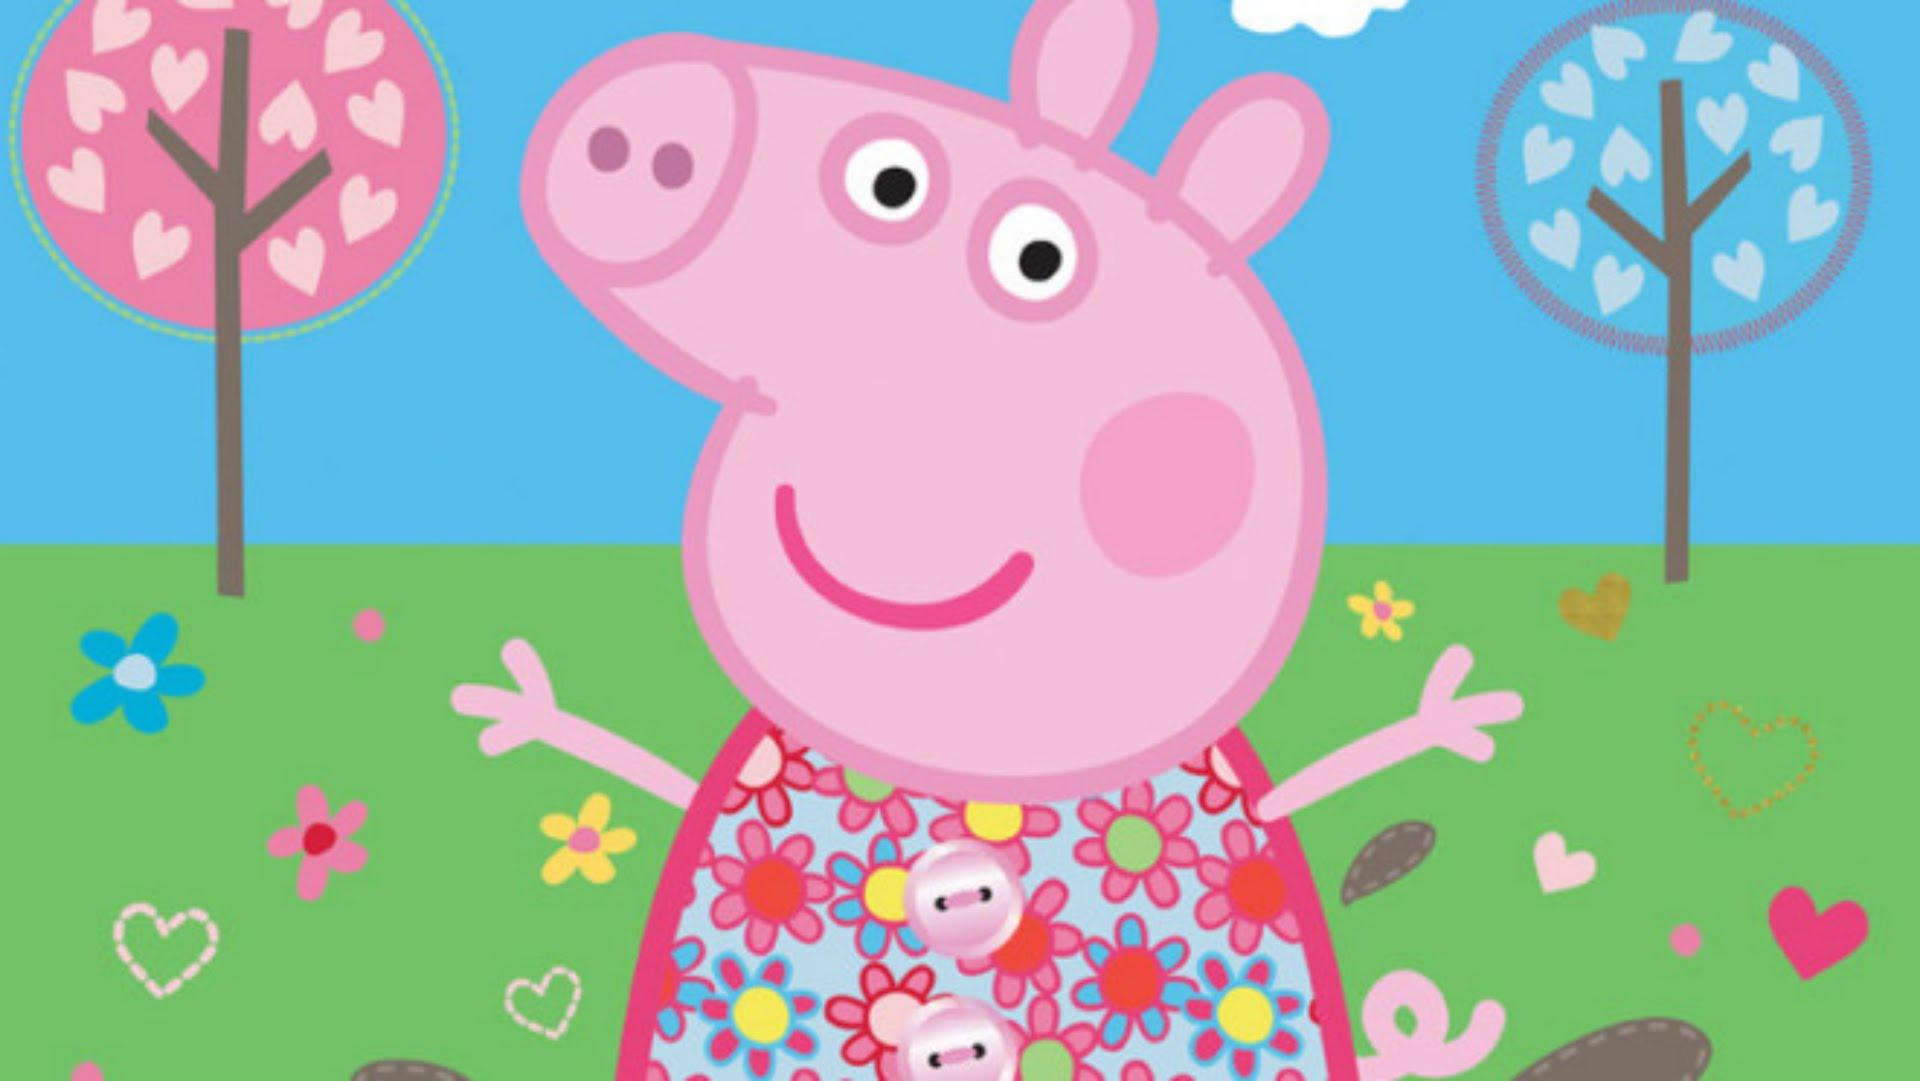 Fondos Peppa Pig wallpapers Peppa Pig